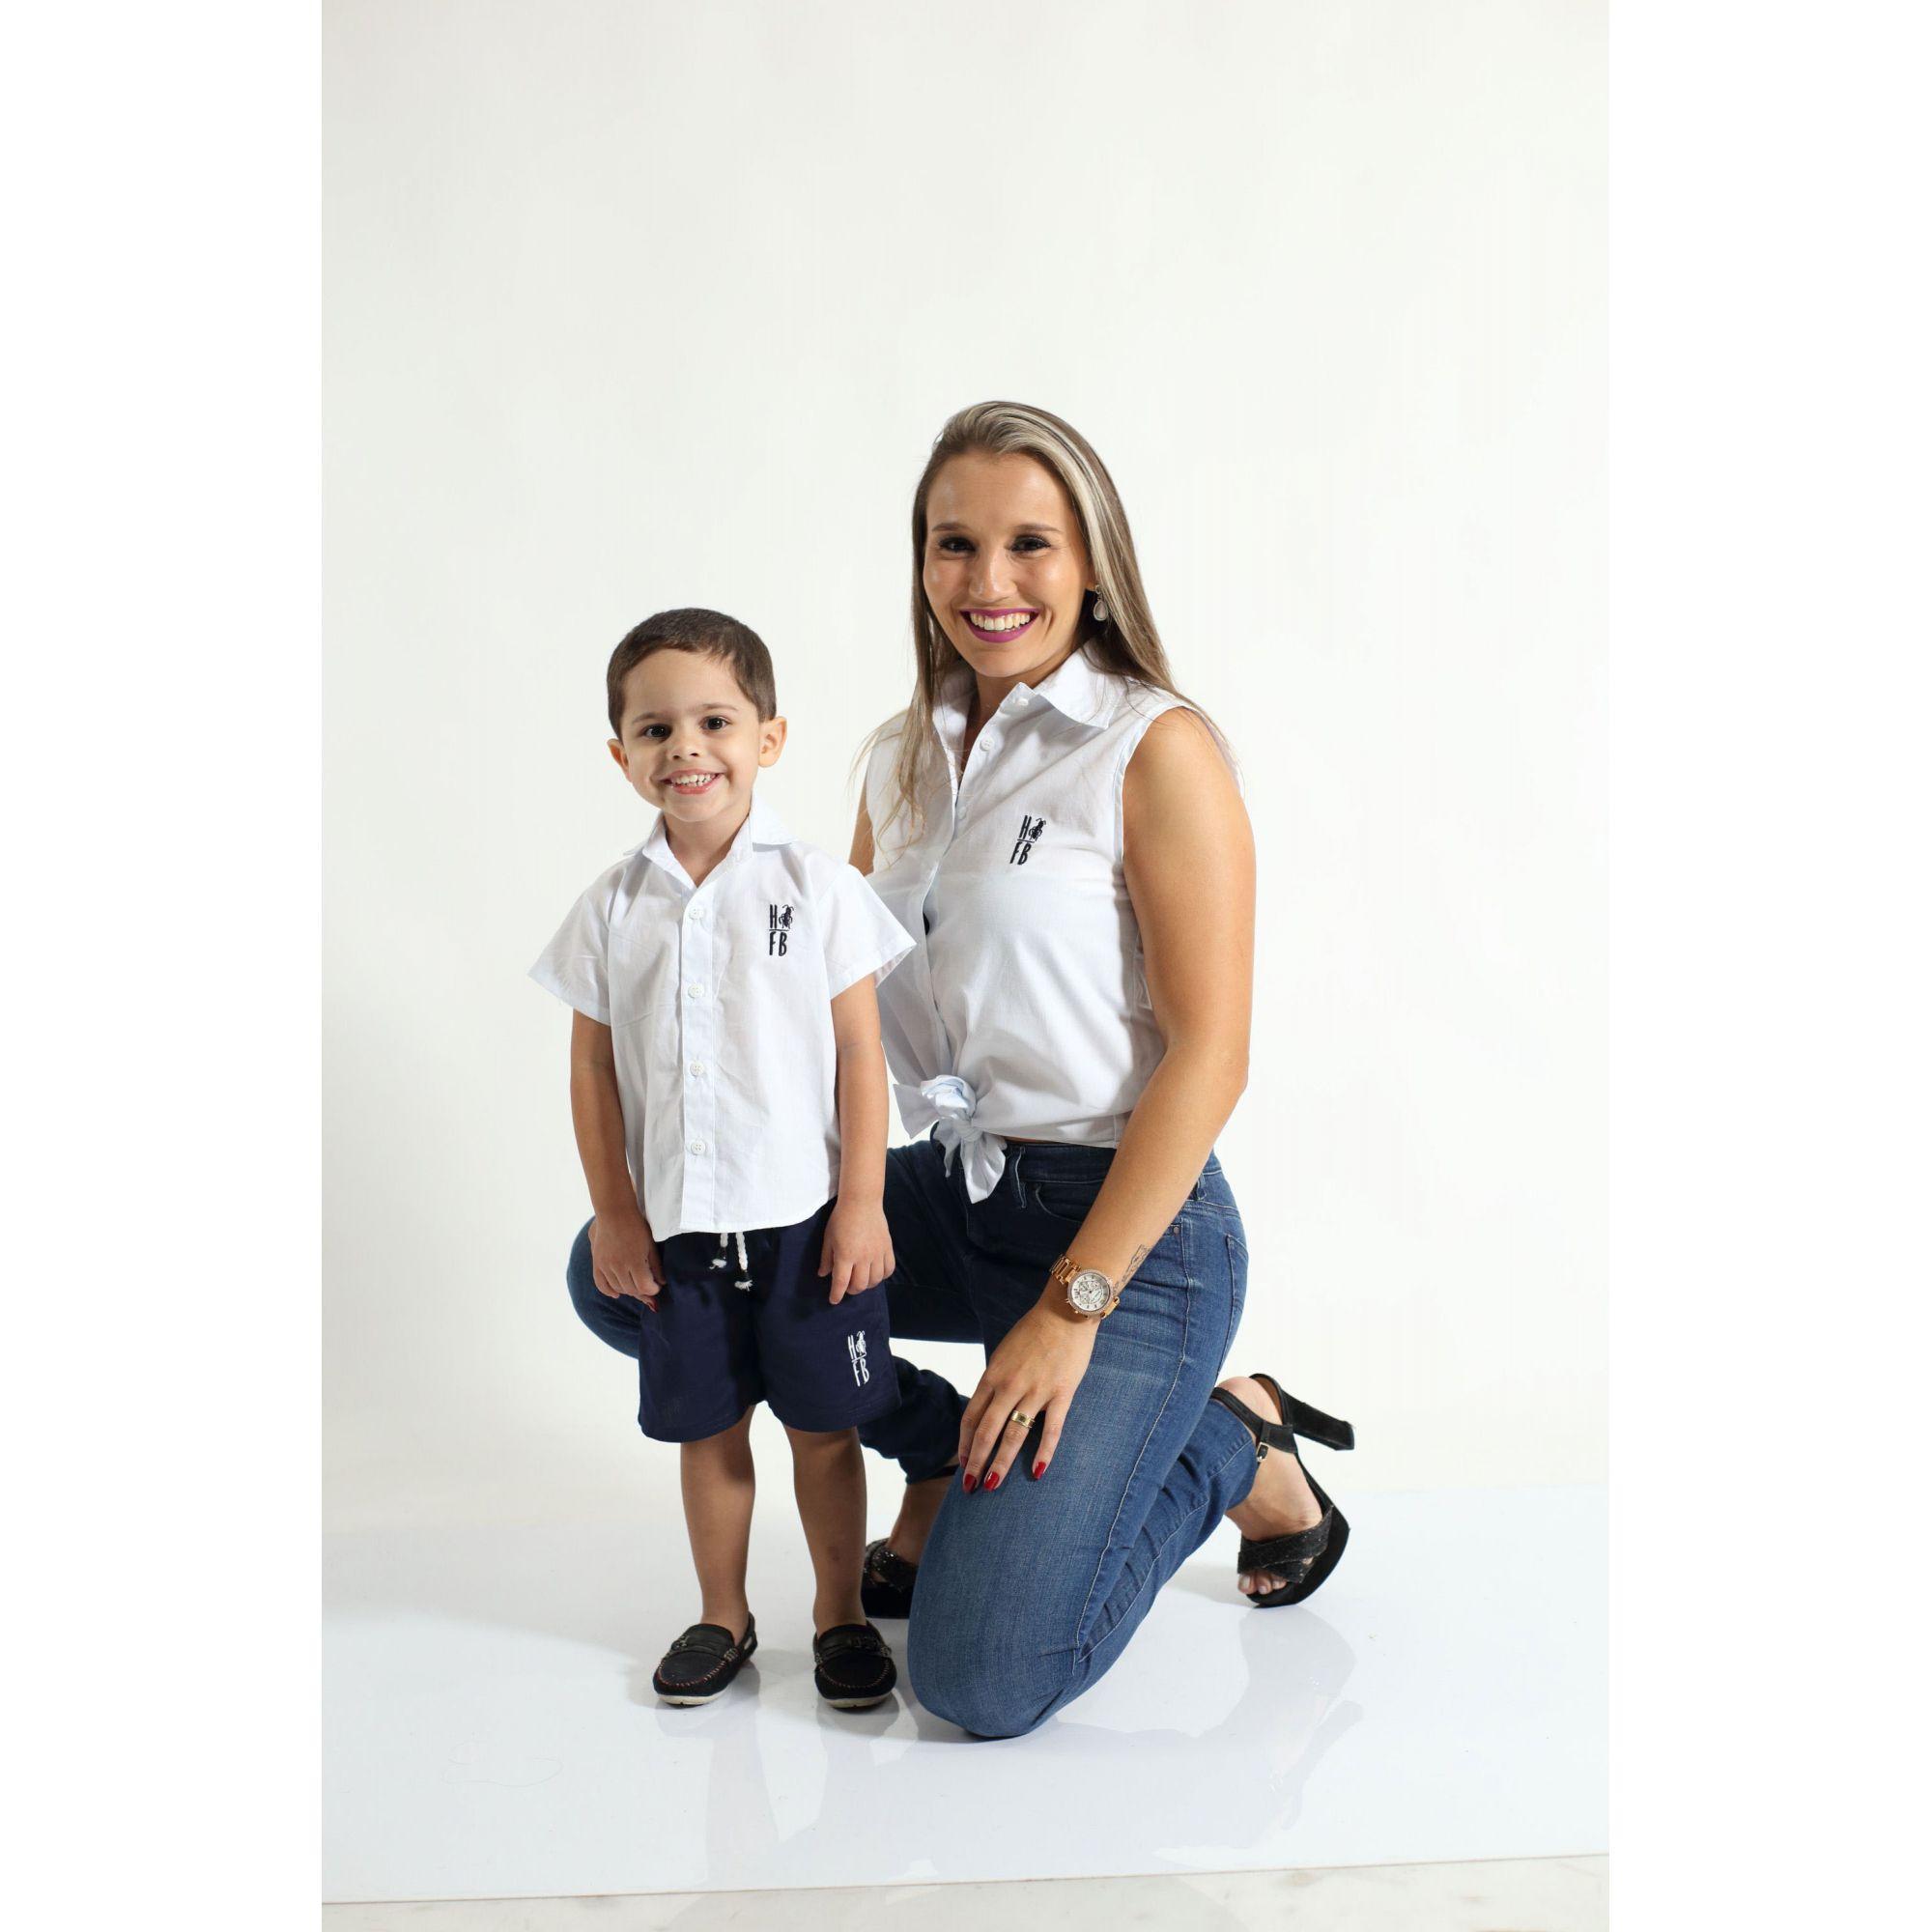 MÃE E FILHO > Kit 02 Camisas Social Adulto e Infantil Branca [Coleção Tal Mãe Tal Filho]